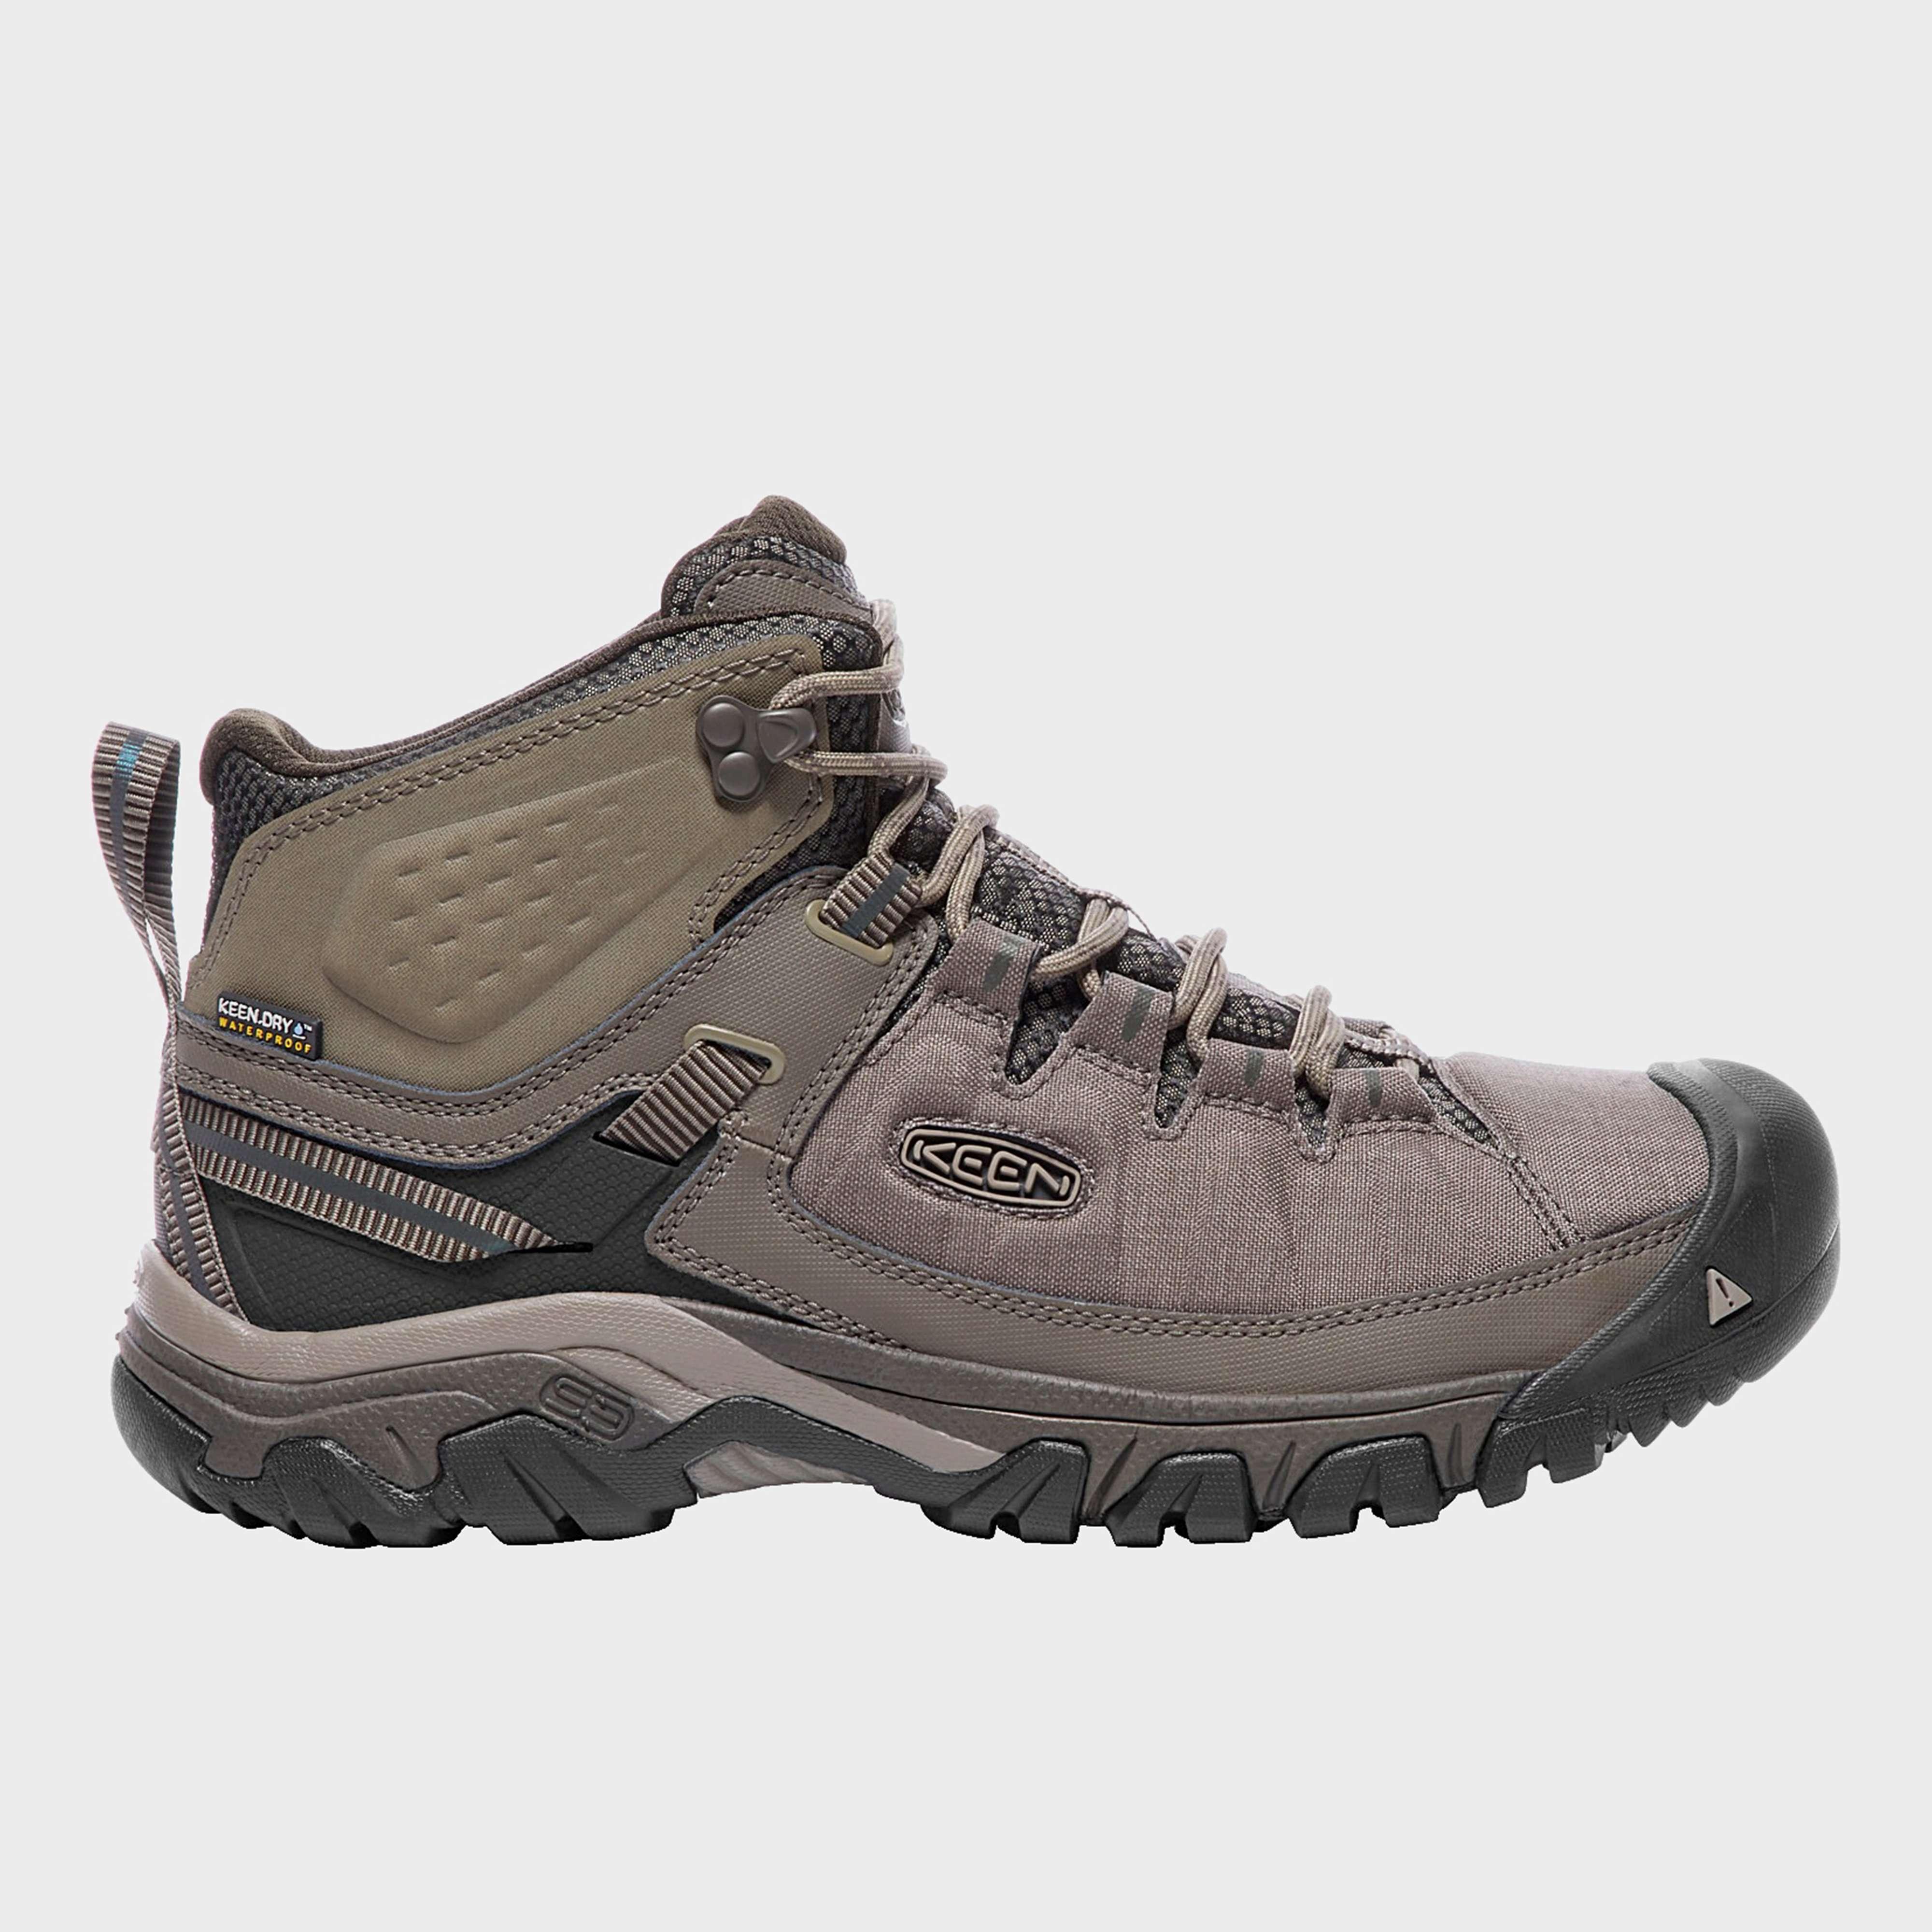 KEEN Men's Targhee EXP Mid Hiking Boot